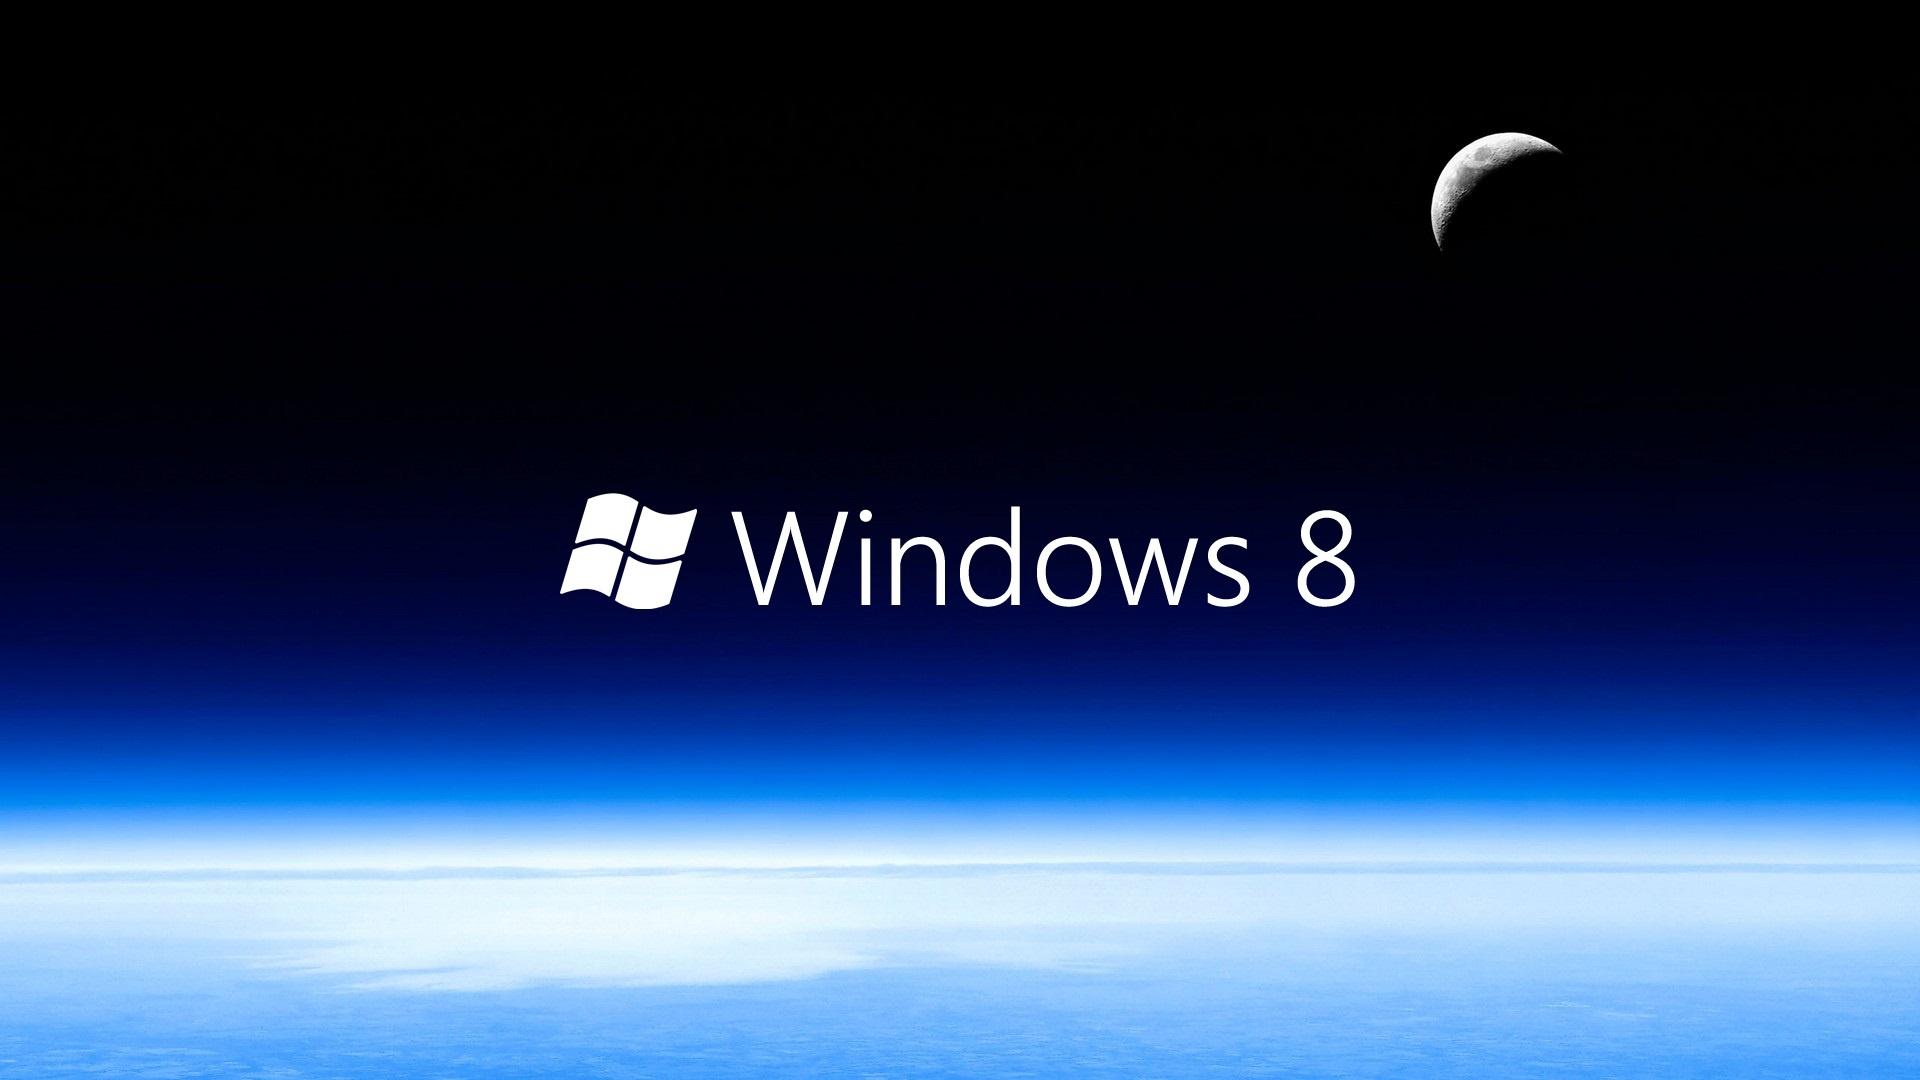 windows hd desktop clipart clipartfox 1920a—1080